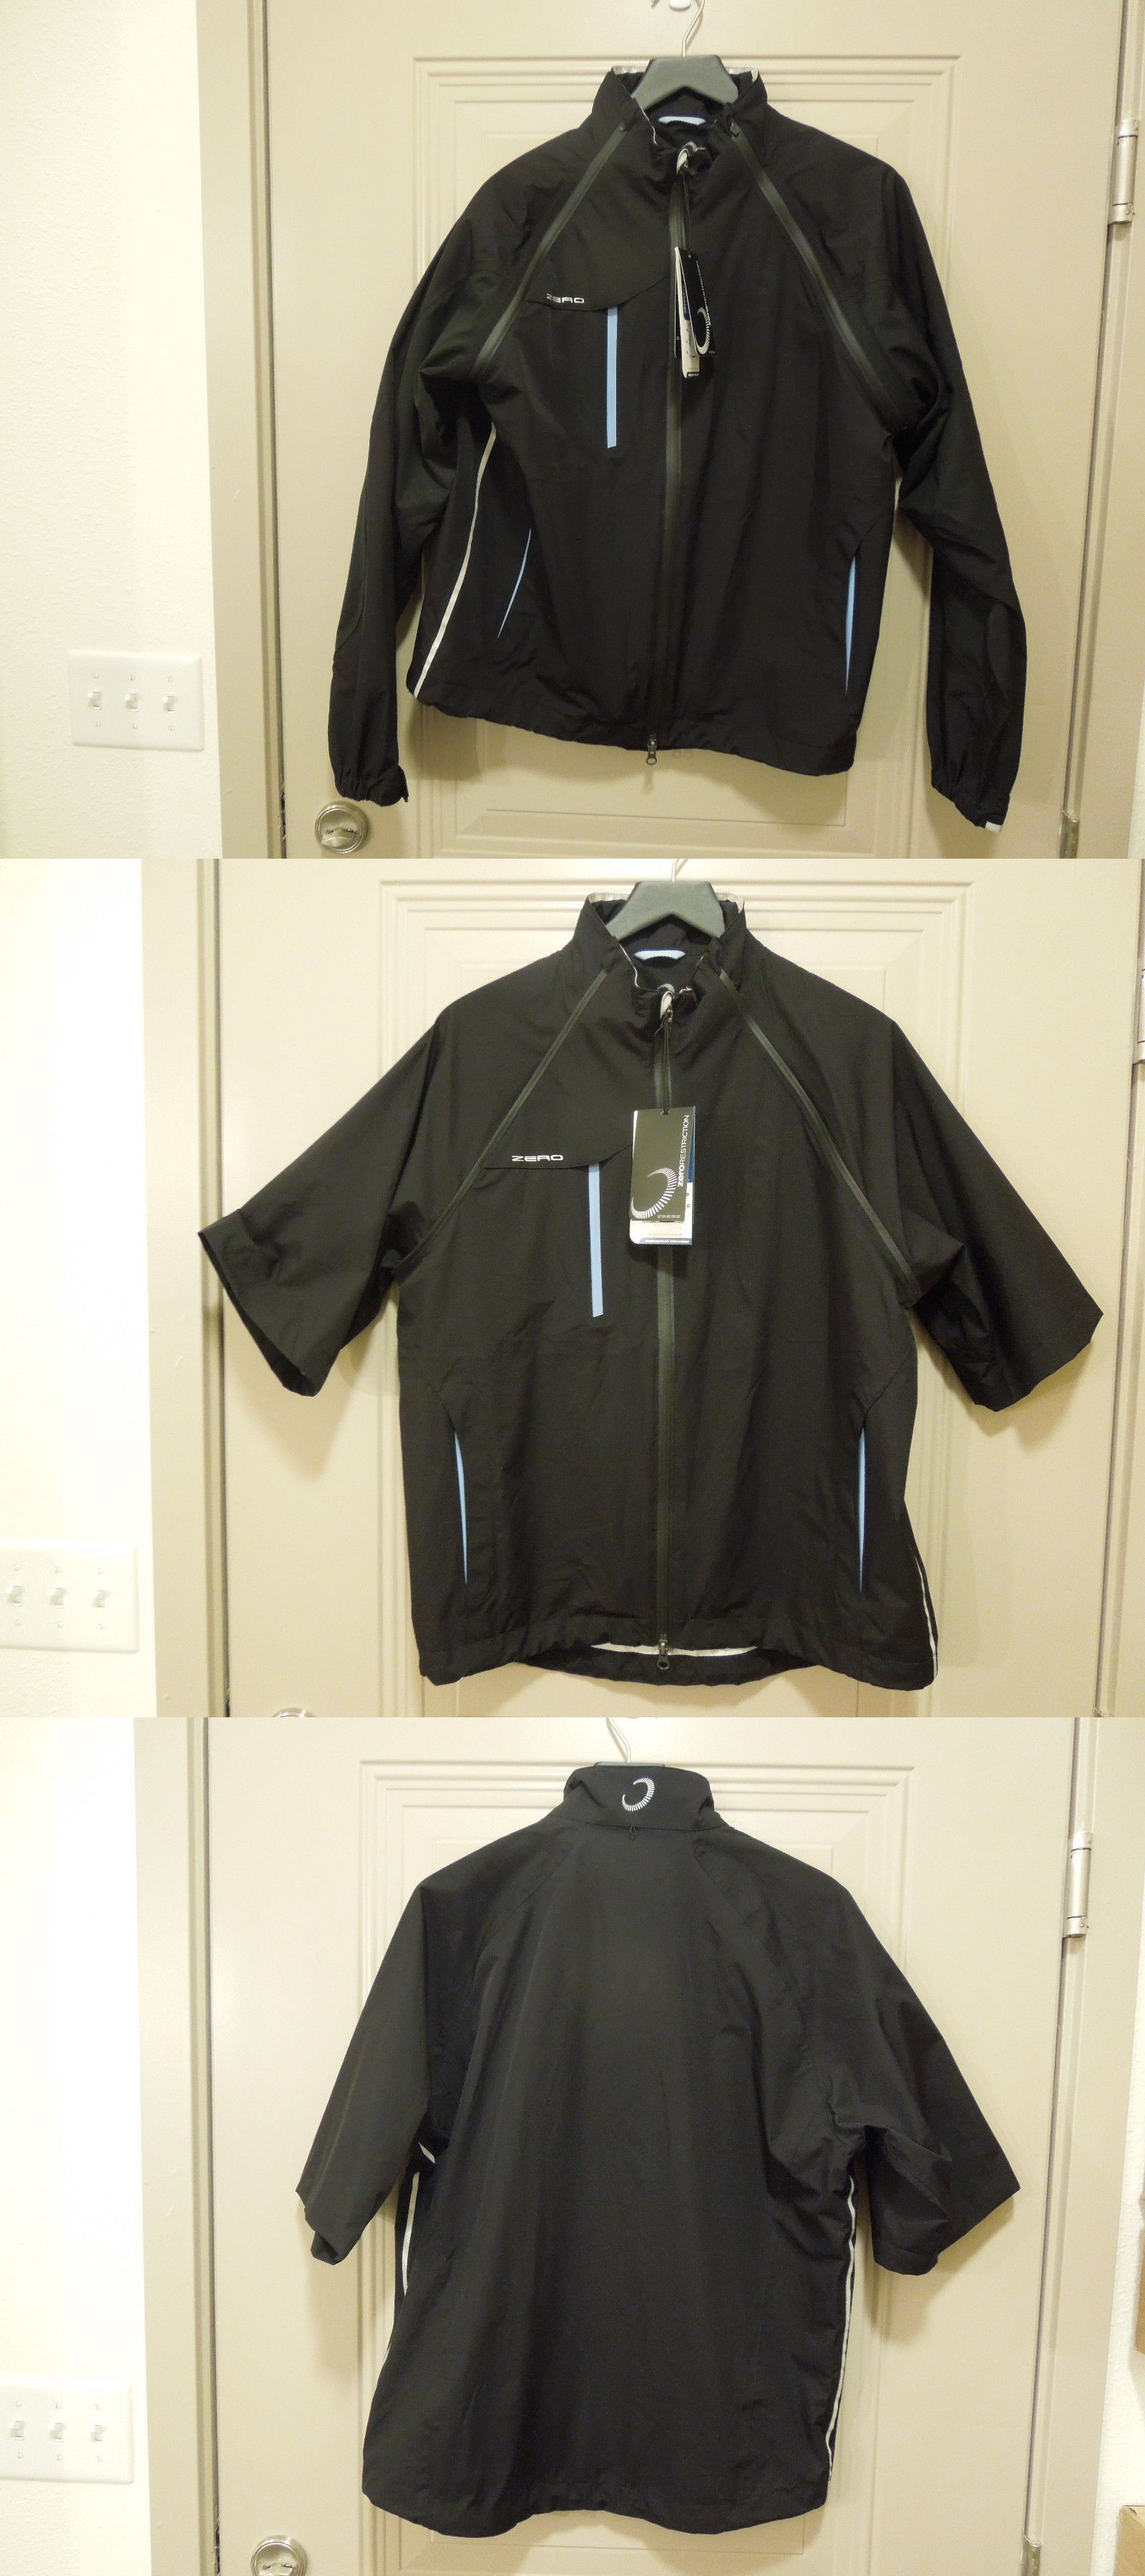 Coats and jackets zero restriction pinnacle traveler golf